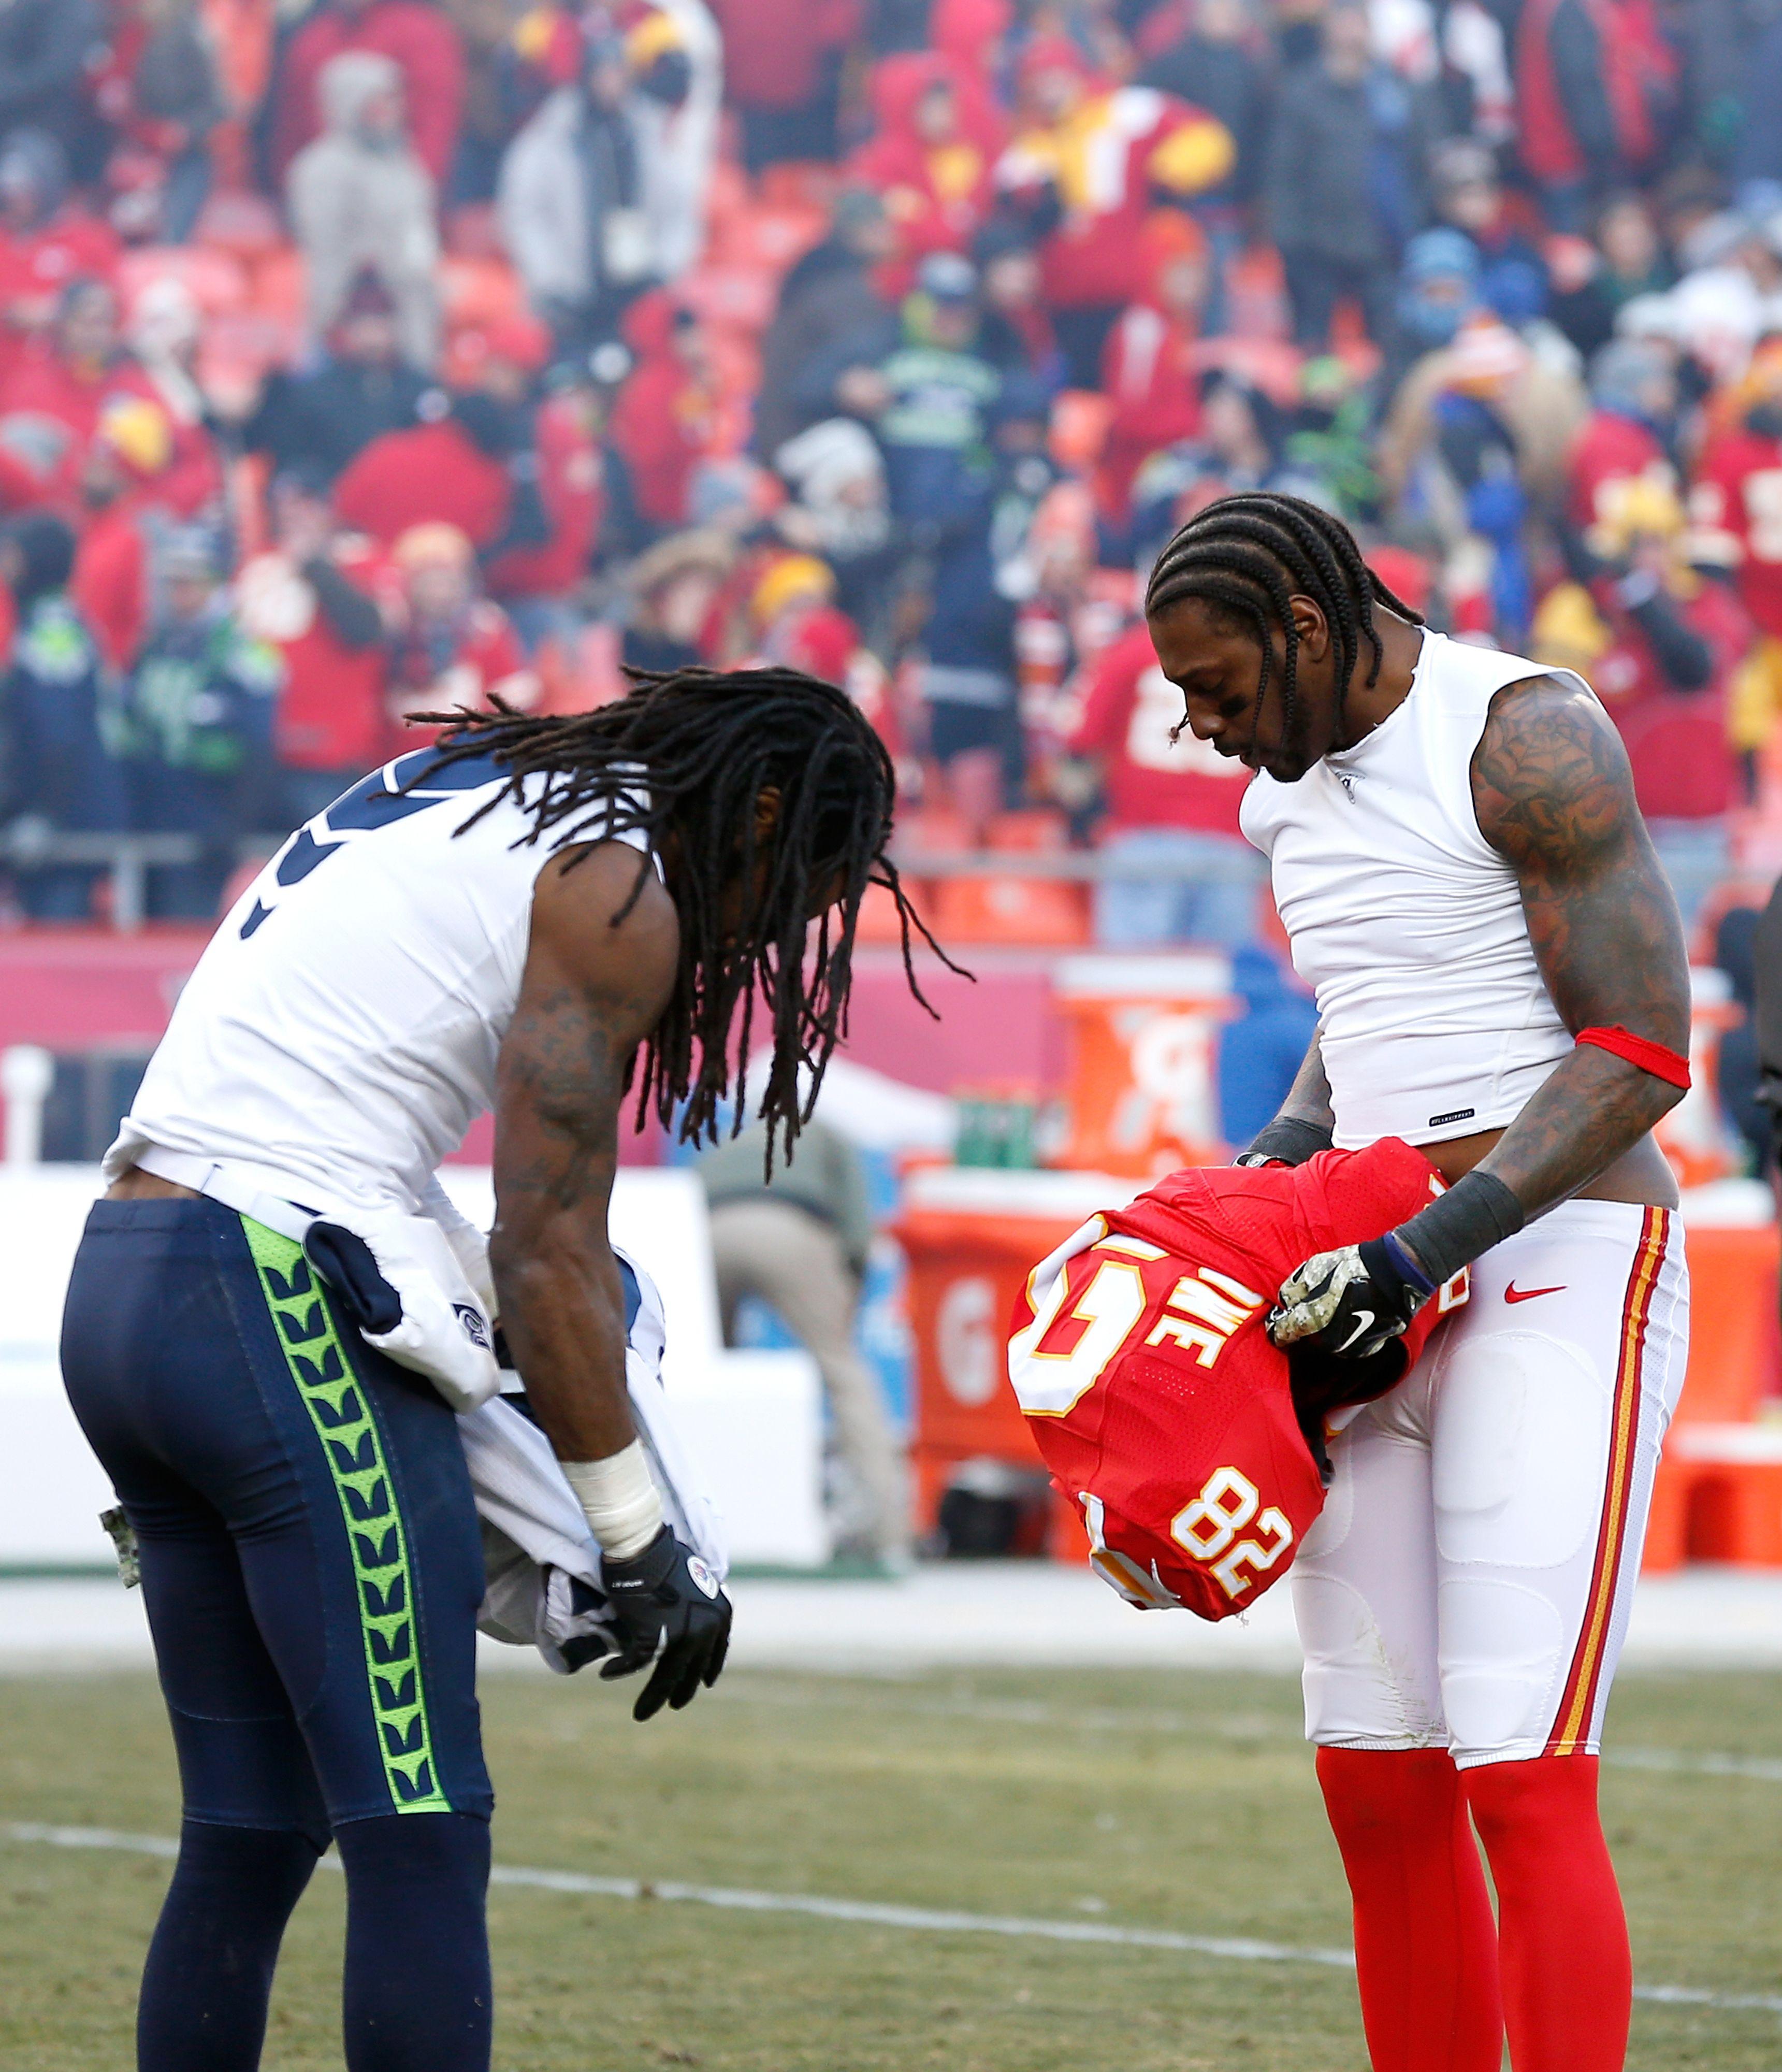 Seattle Seahawks cornerback Richard Sherman (25) and Kansas City Chiefs  wide receiver Dwayne Bowe (82) trade jerseys following an NFL football game  at ...